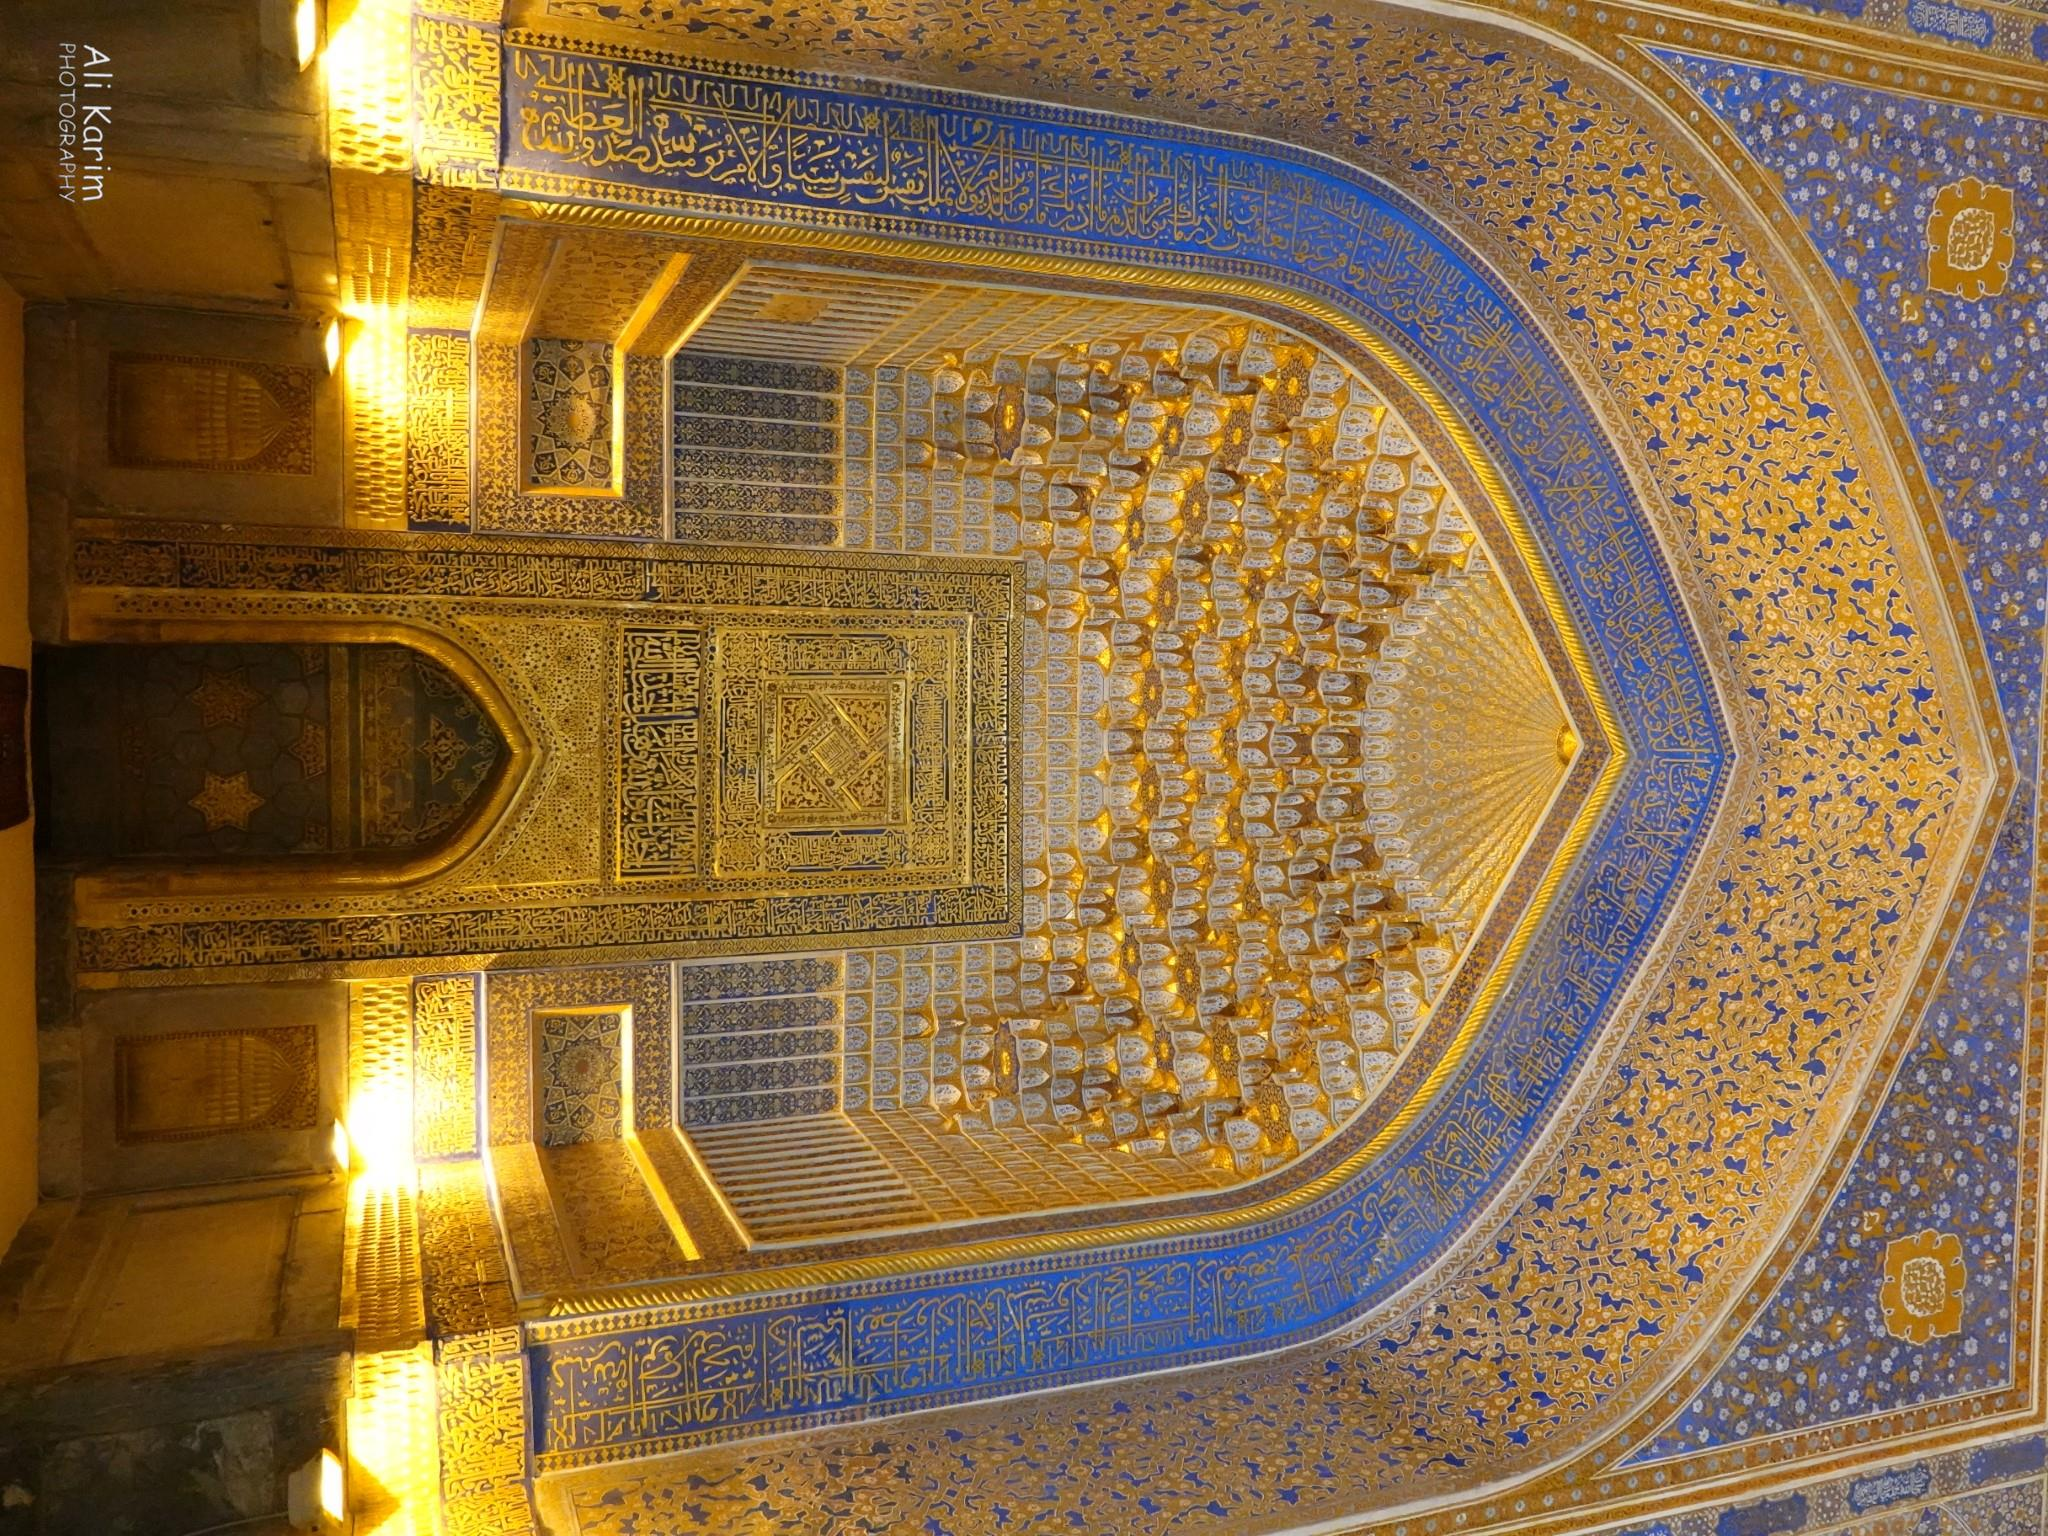 More Samarkand, Inside an elaborate mosque